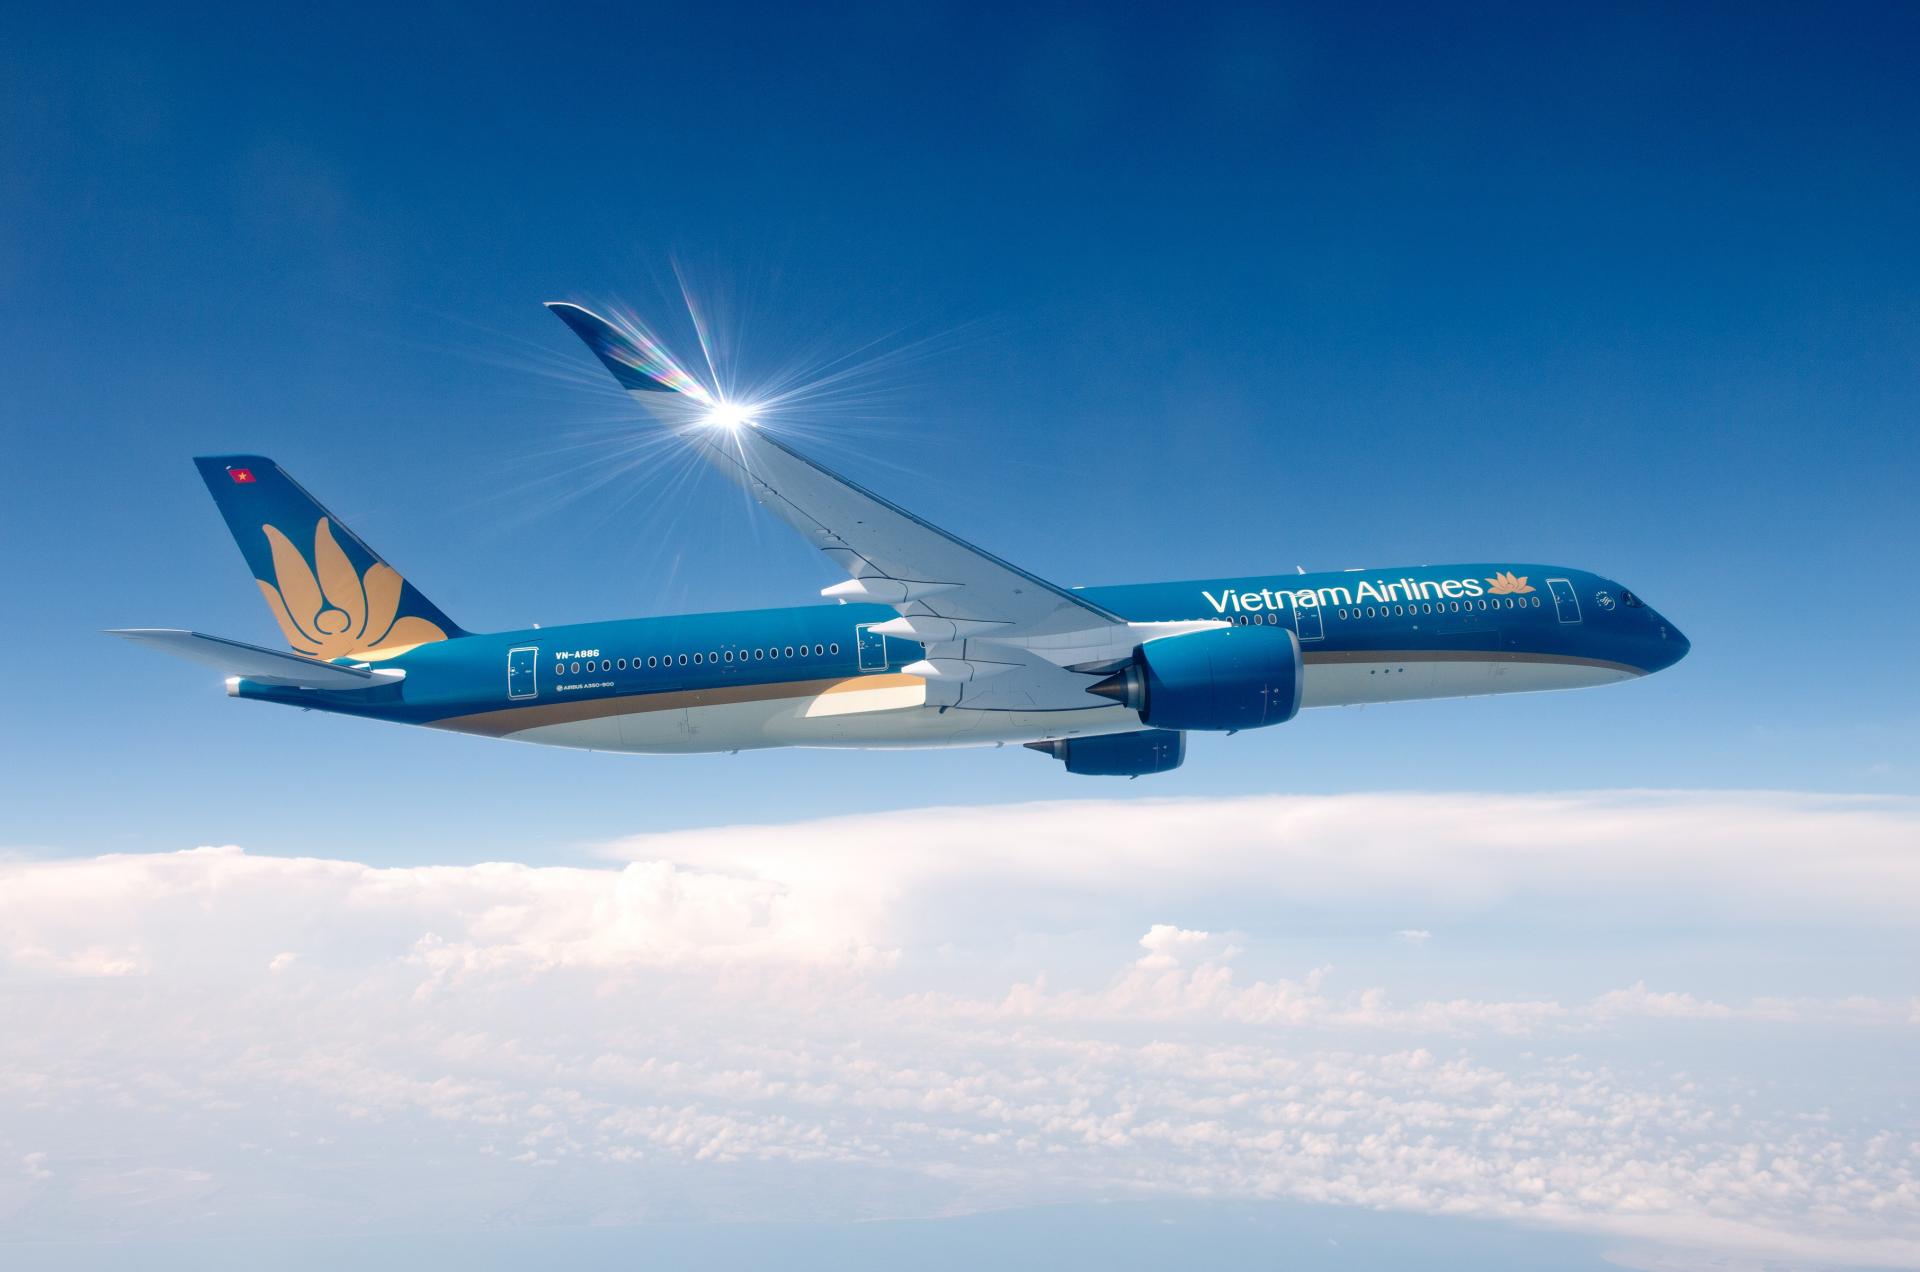 vietnam airlines reopens international flights from july 1